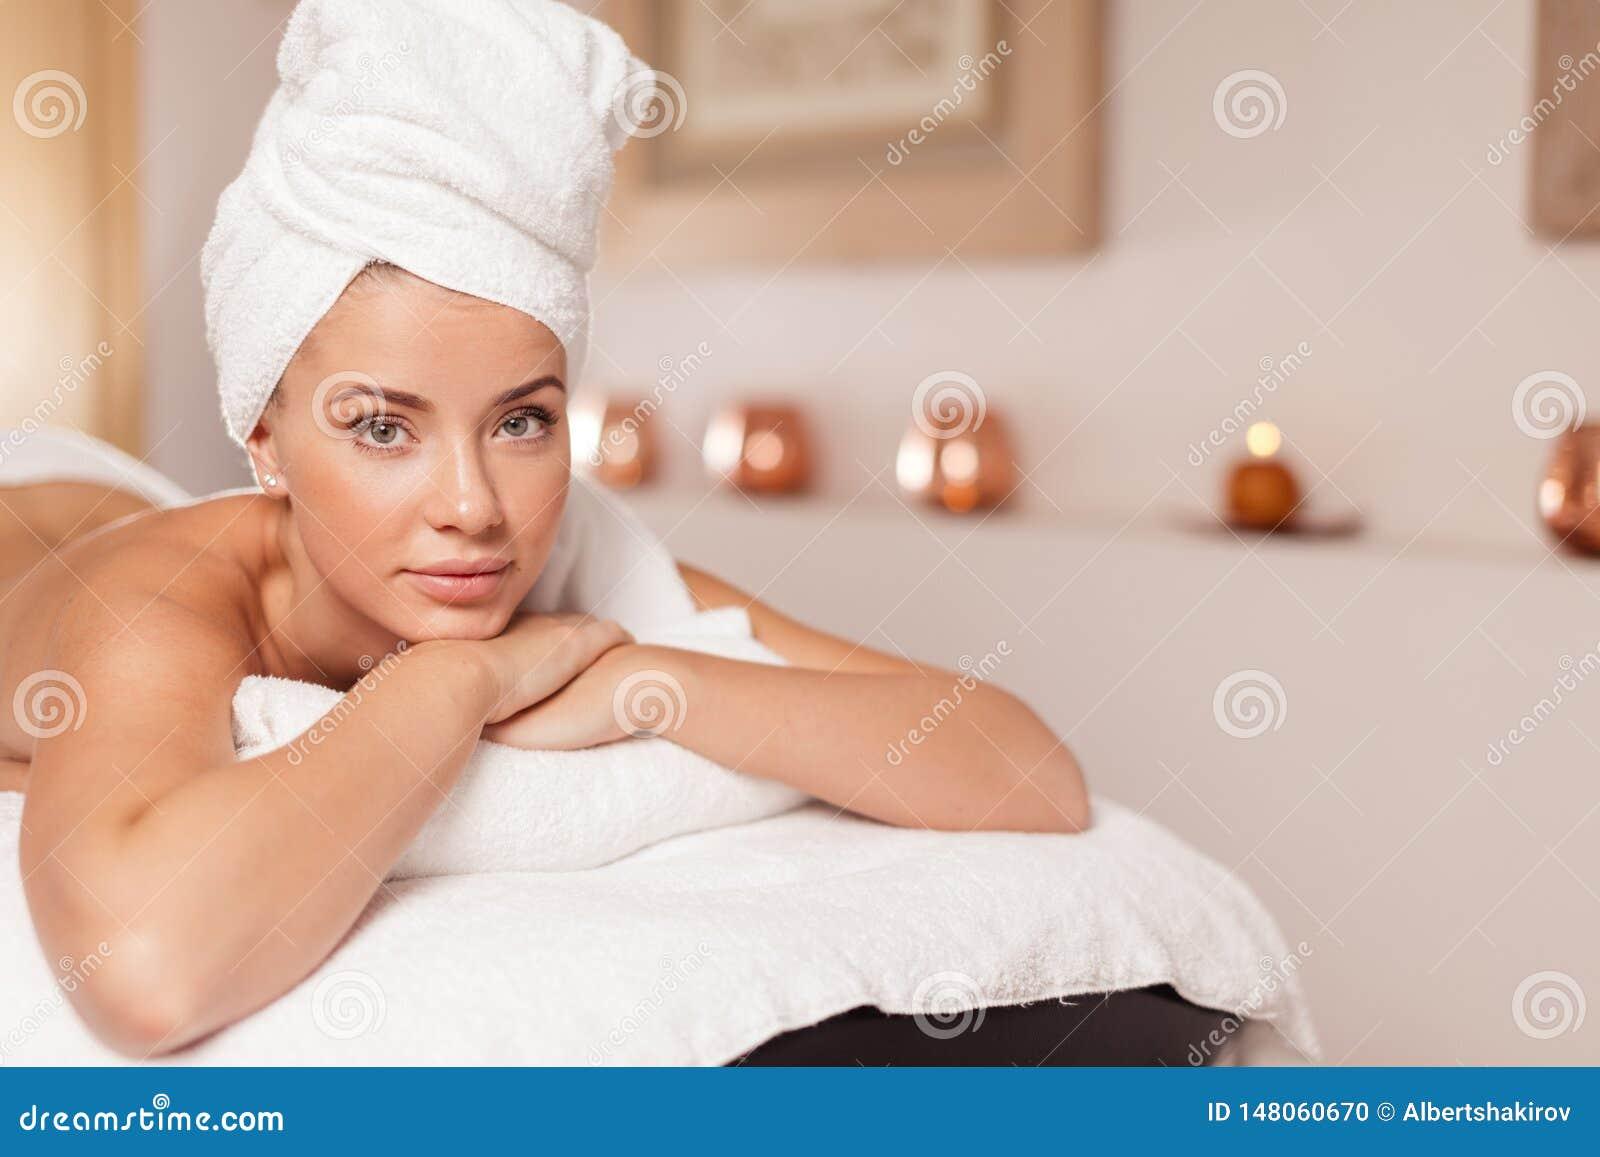 Young beautiful woman preparing for procedure